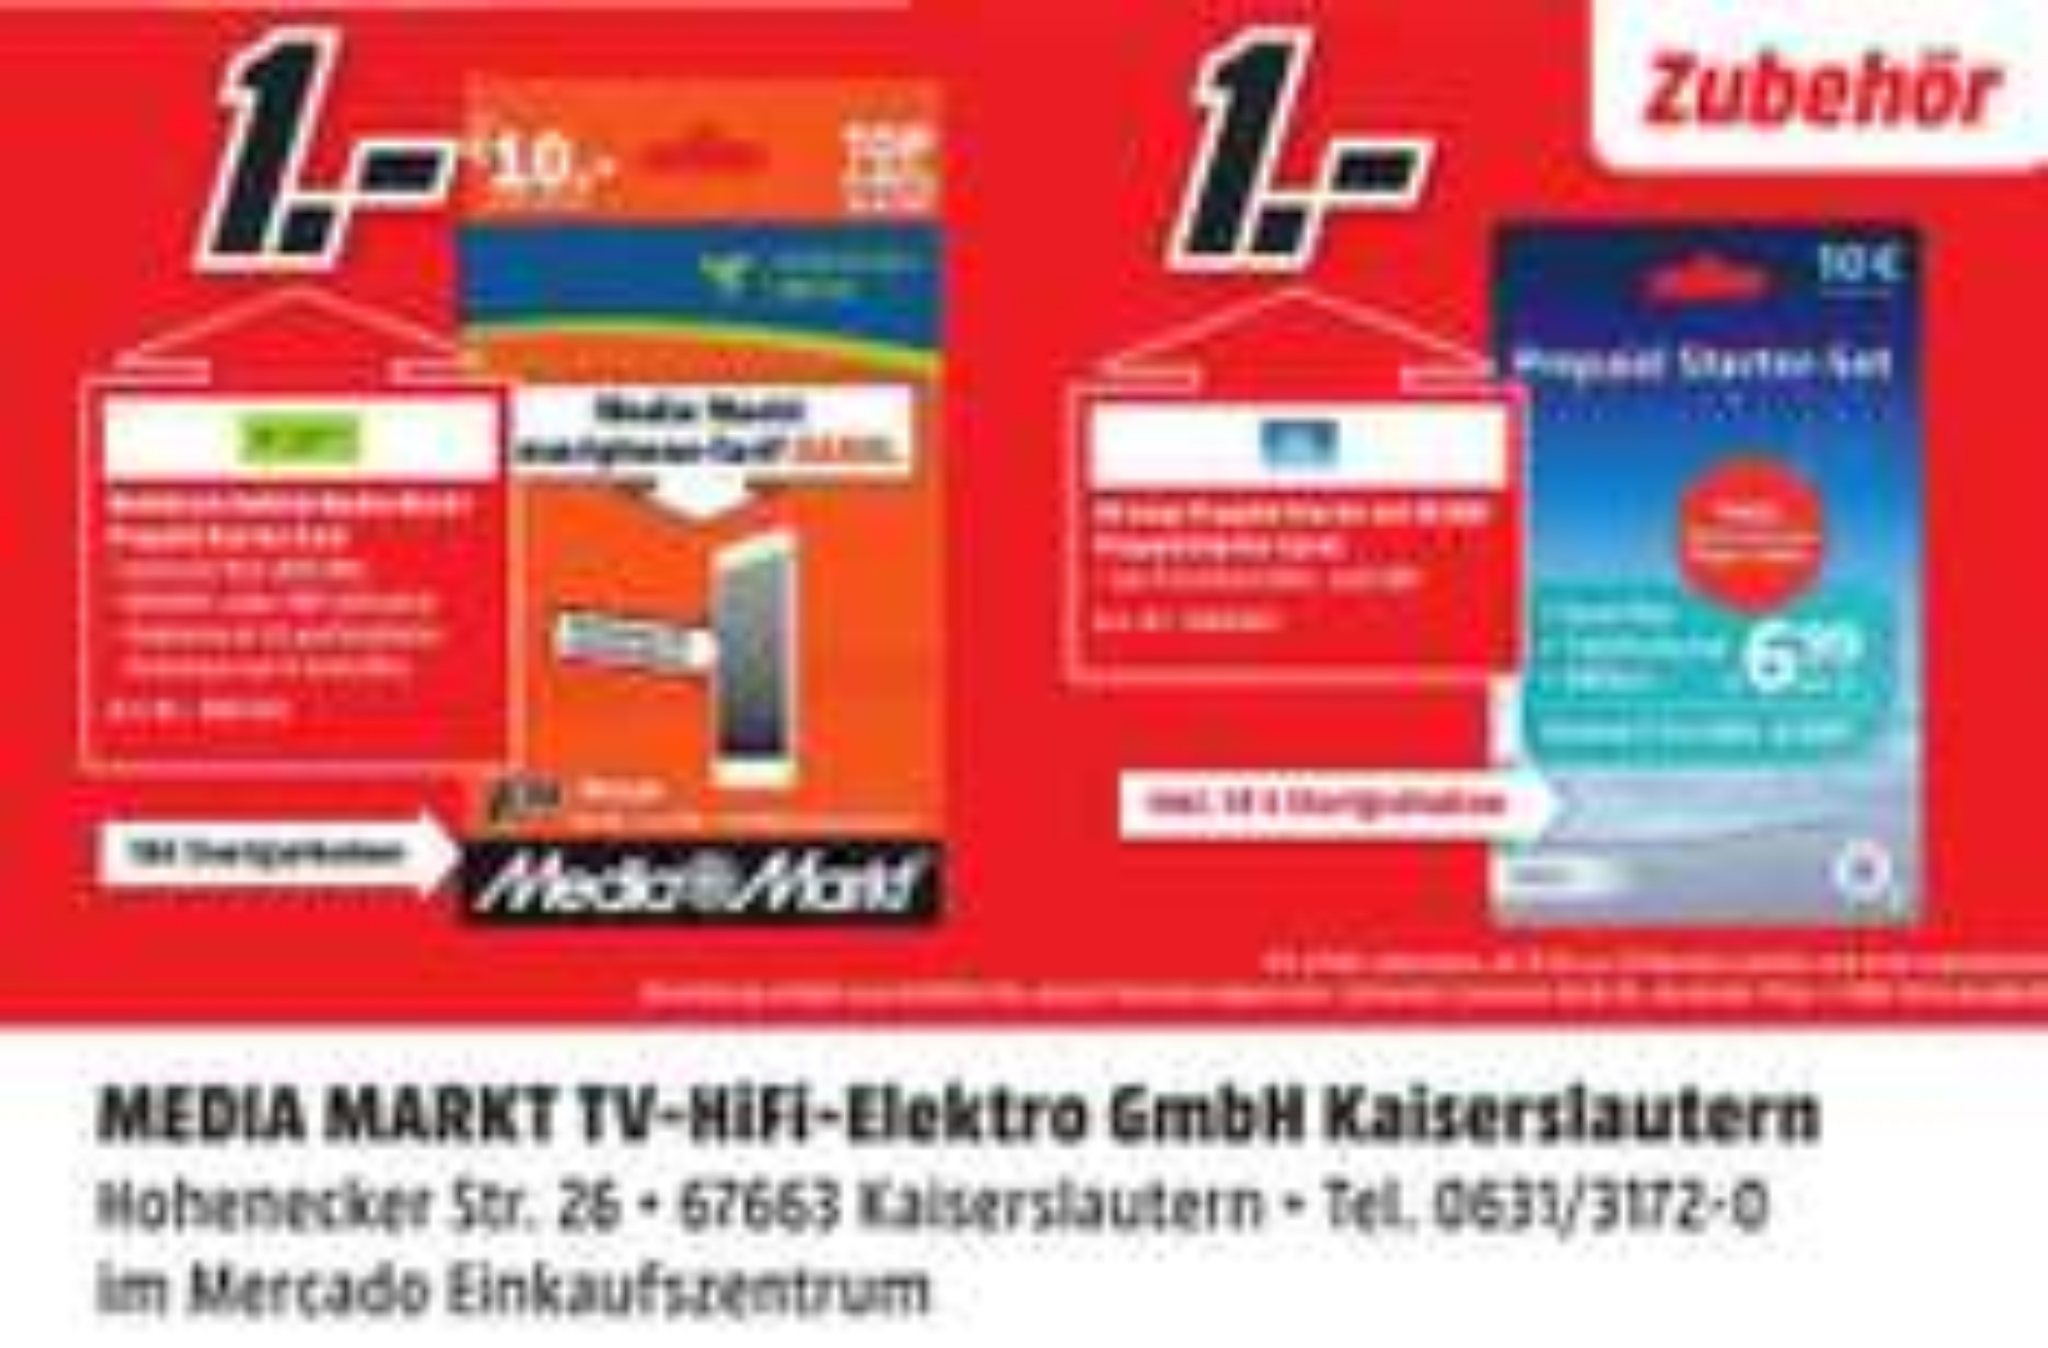 lokal MM Kaiserslautern - o2 / mobilcom-debitel Prepaid StarterSet inkl. 10€ Guthaben für je 1€